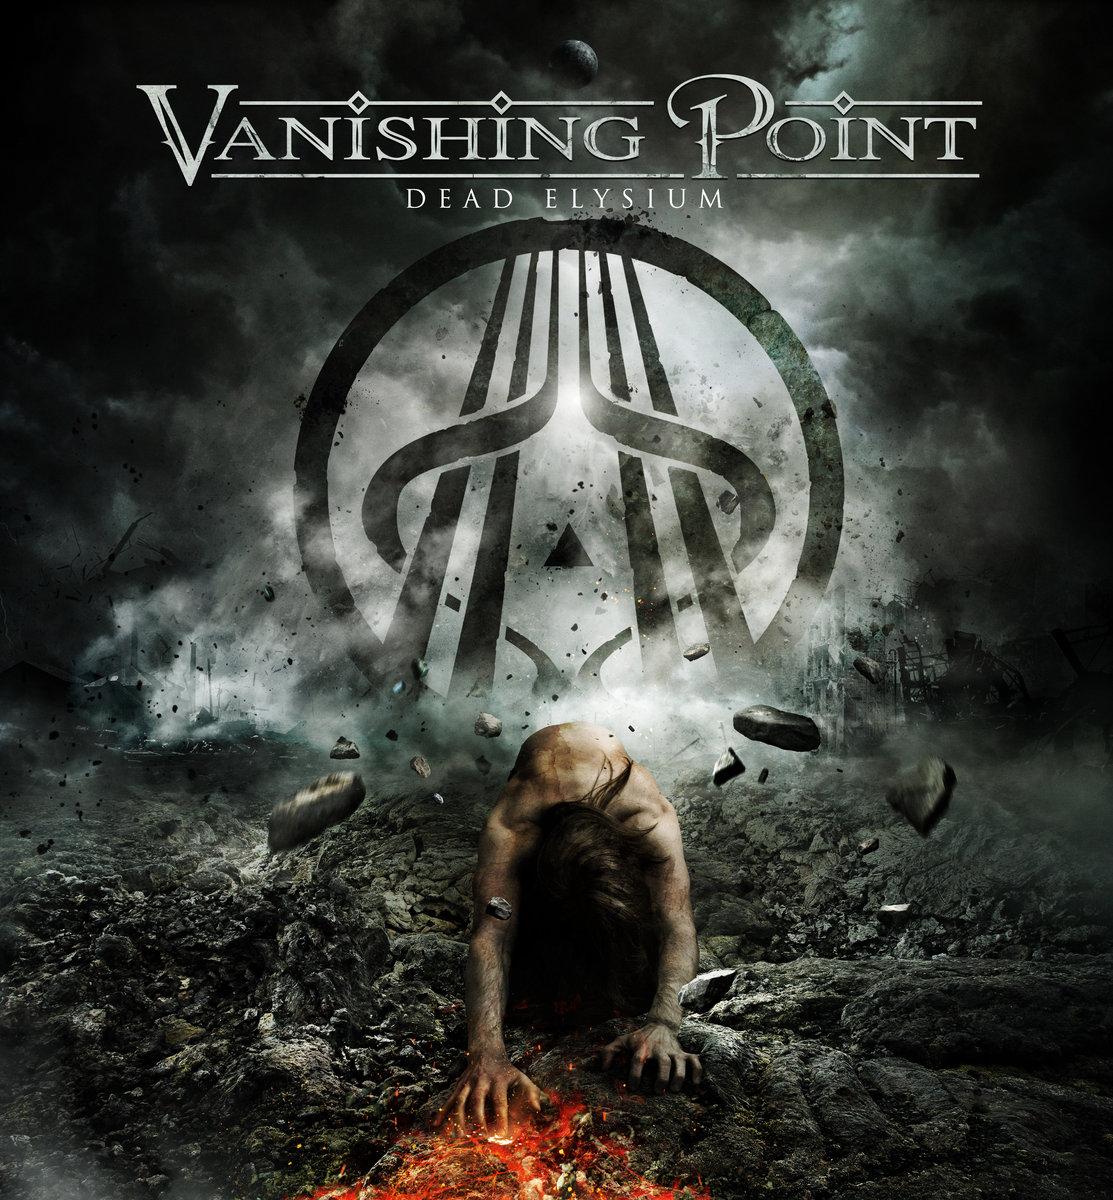 Vanishing Point: Dead Elysium